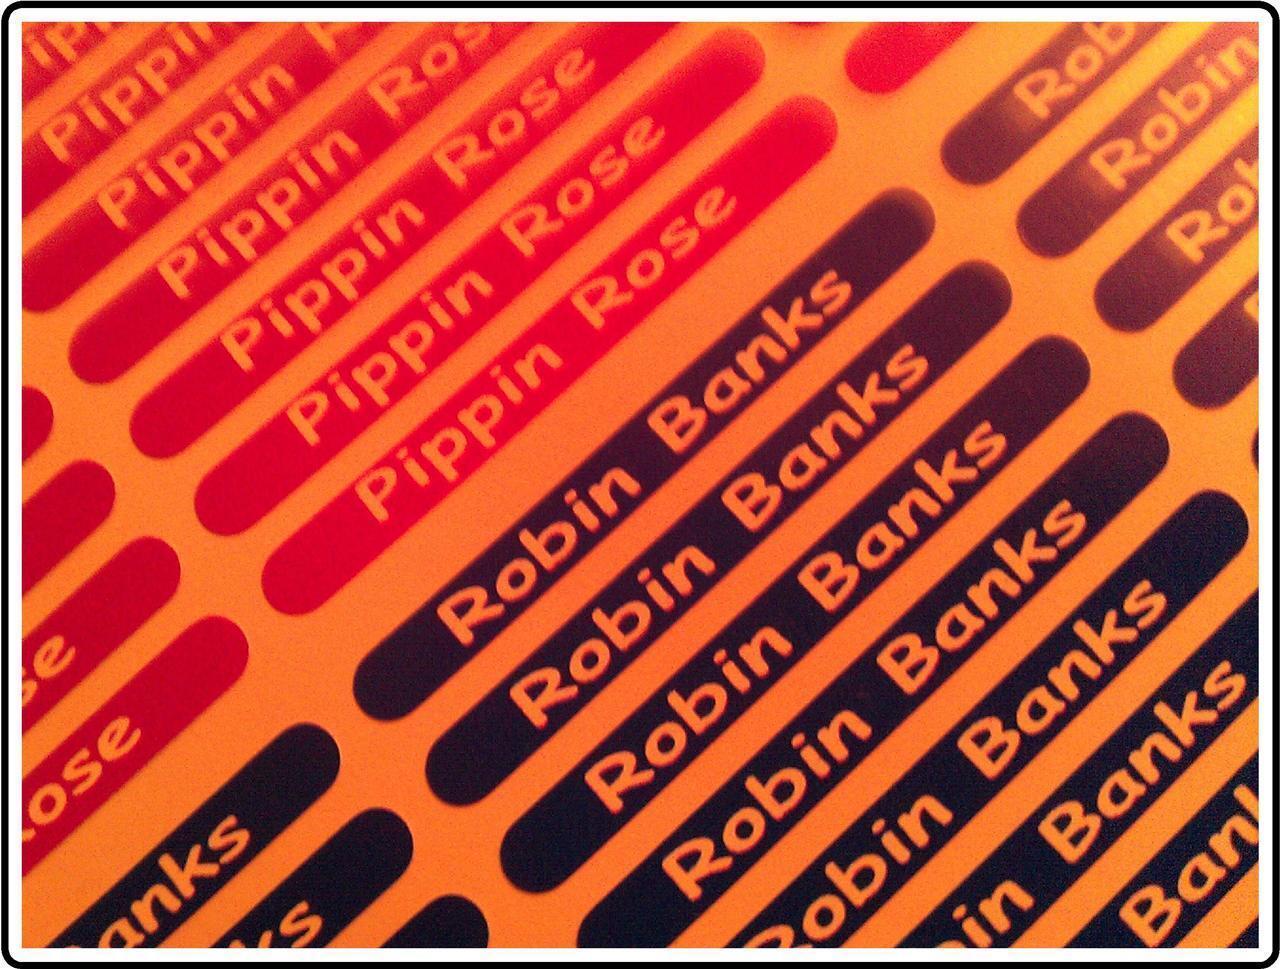 s l1600 - 100 Personalizado Mini Nombre Pegatinas-Etiquetas-Adhesivos-Impermeable